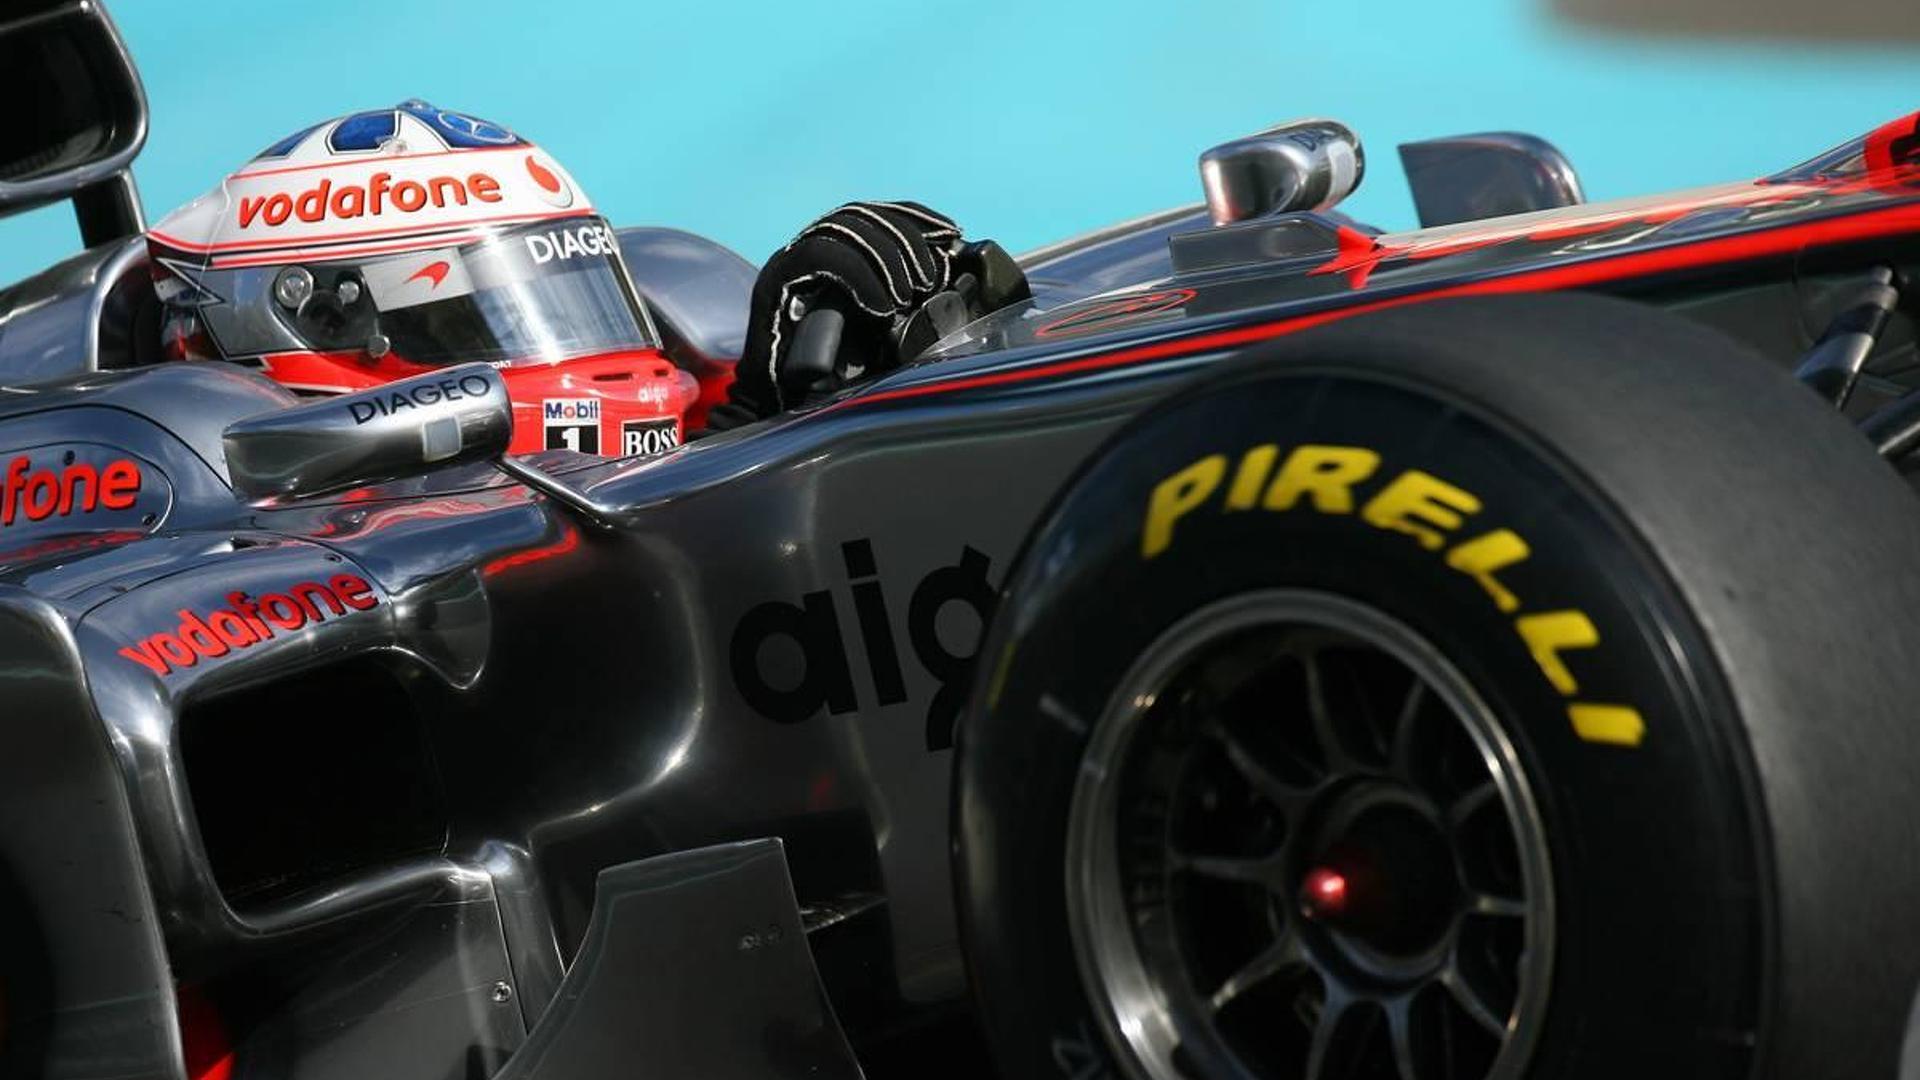 Pirelli not radically different to Bridgestone - Paffett